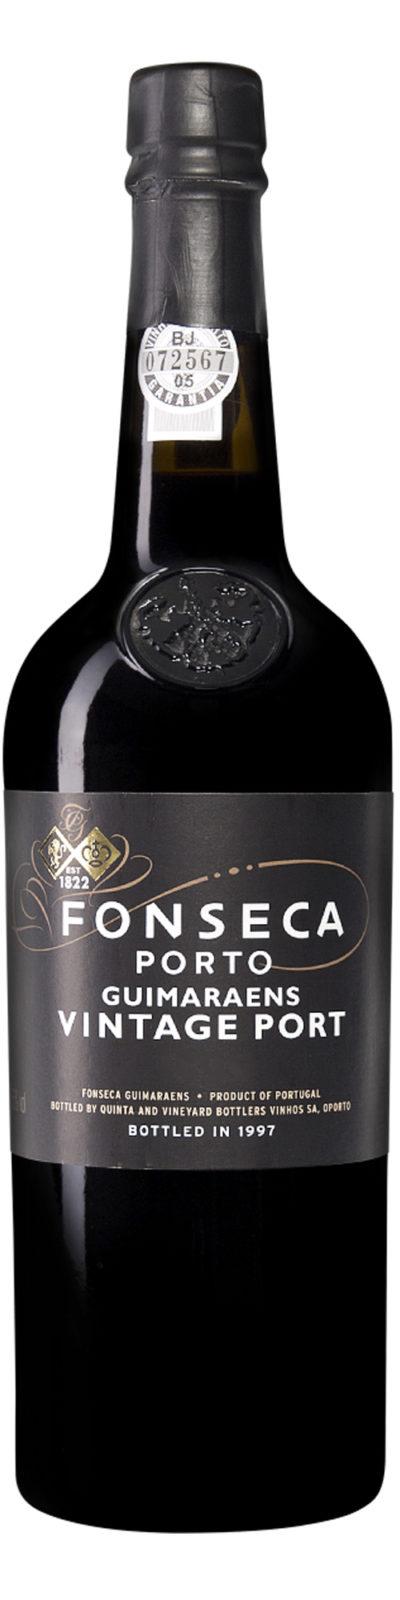 Fonseca Guimaraens Vintage Port 1996 halvflaska